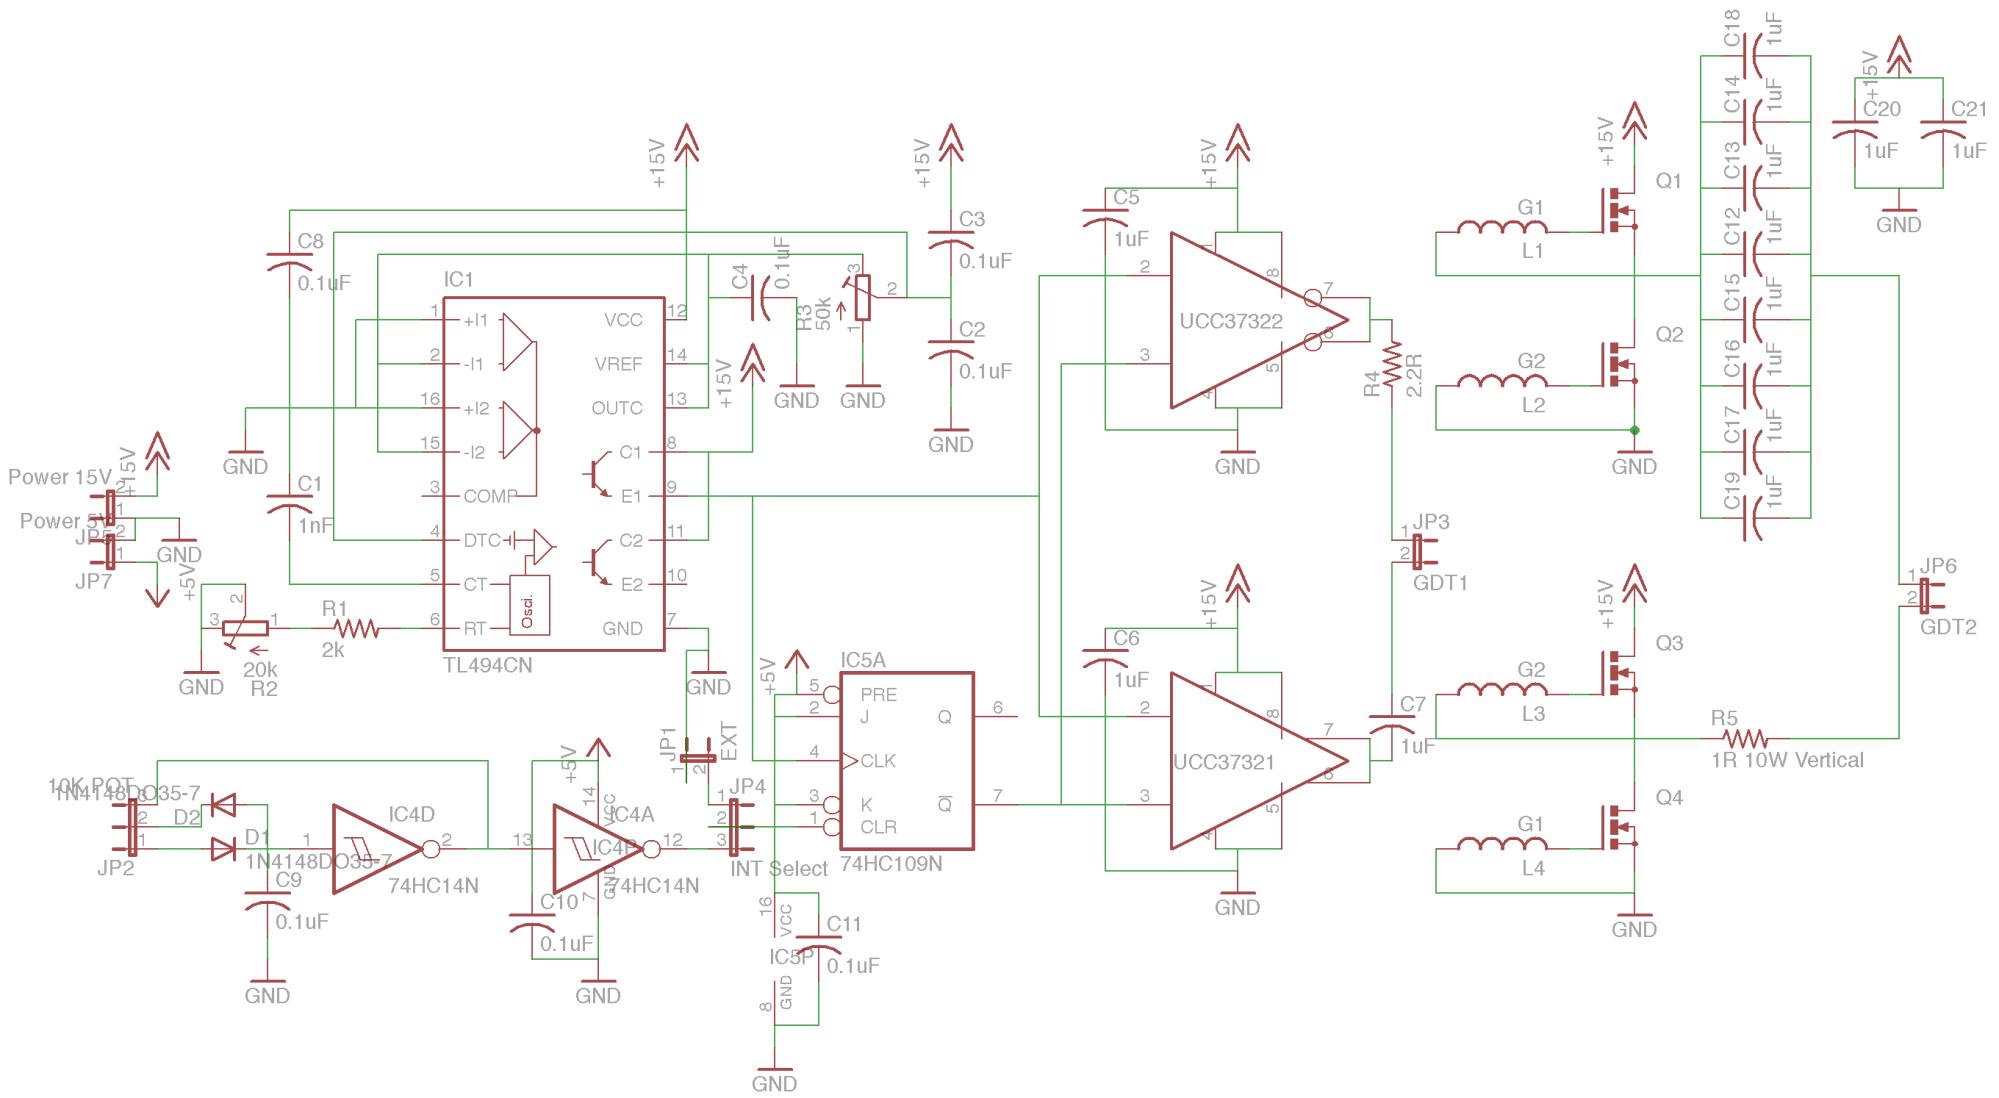 hight resolution of daniel kramnik s project log